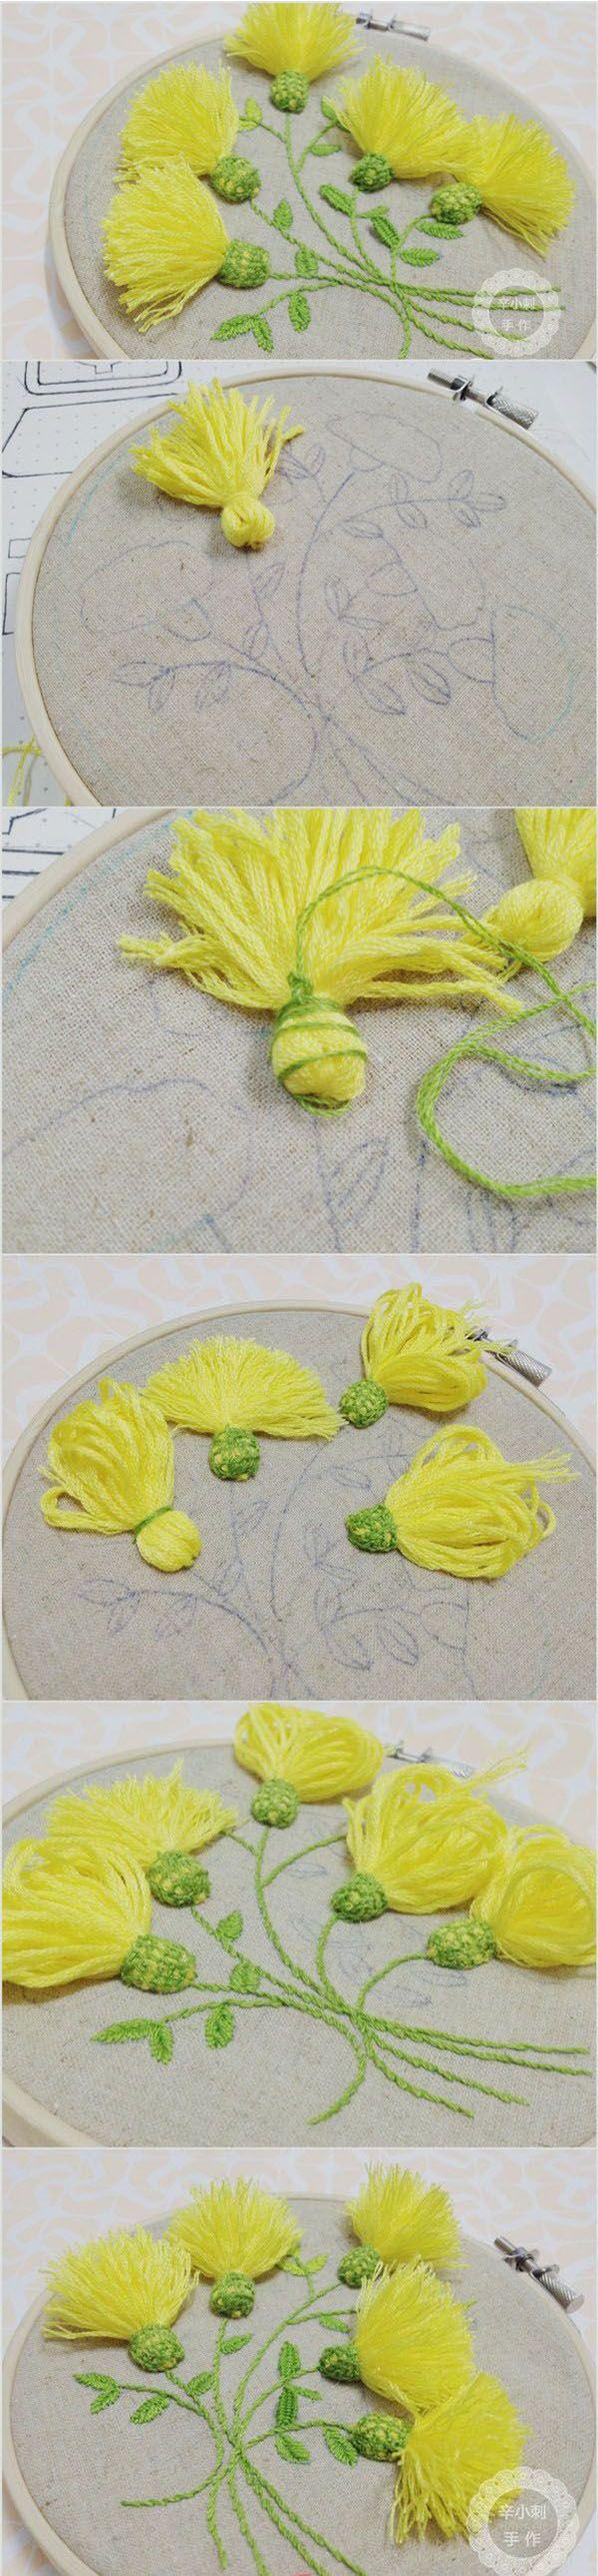 Diy Beautiful Chrysanthemum | DIY & Crafts Tutorials